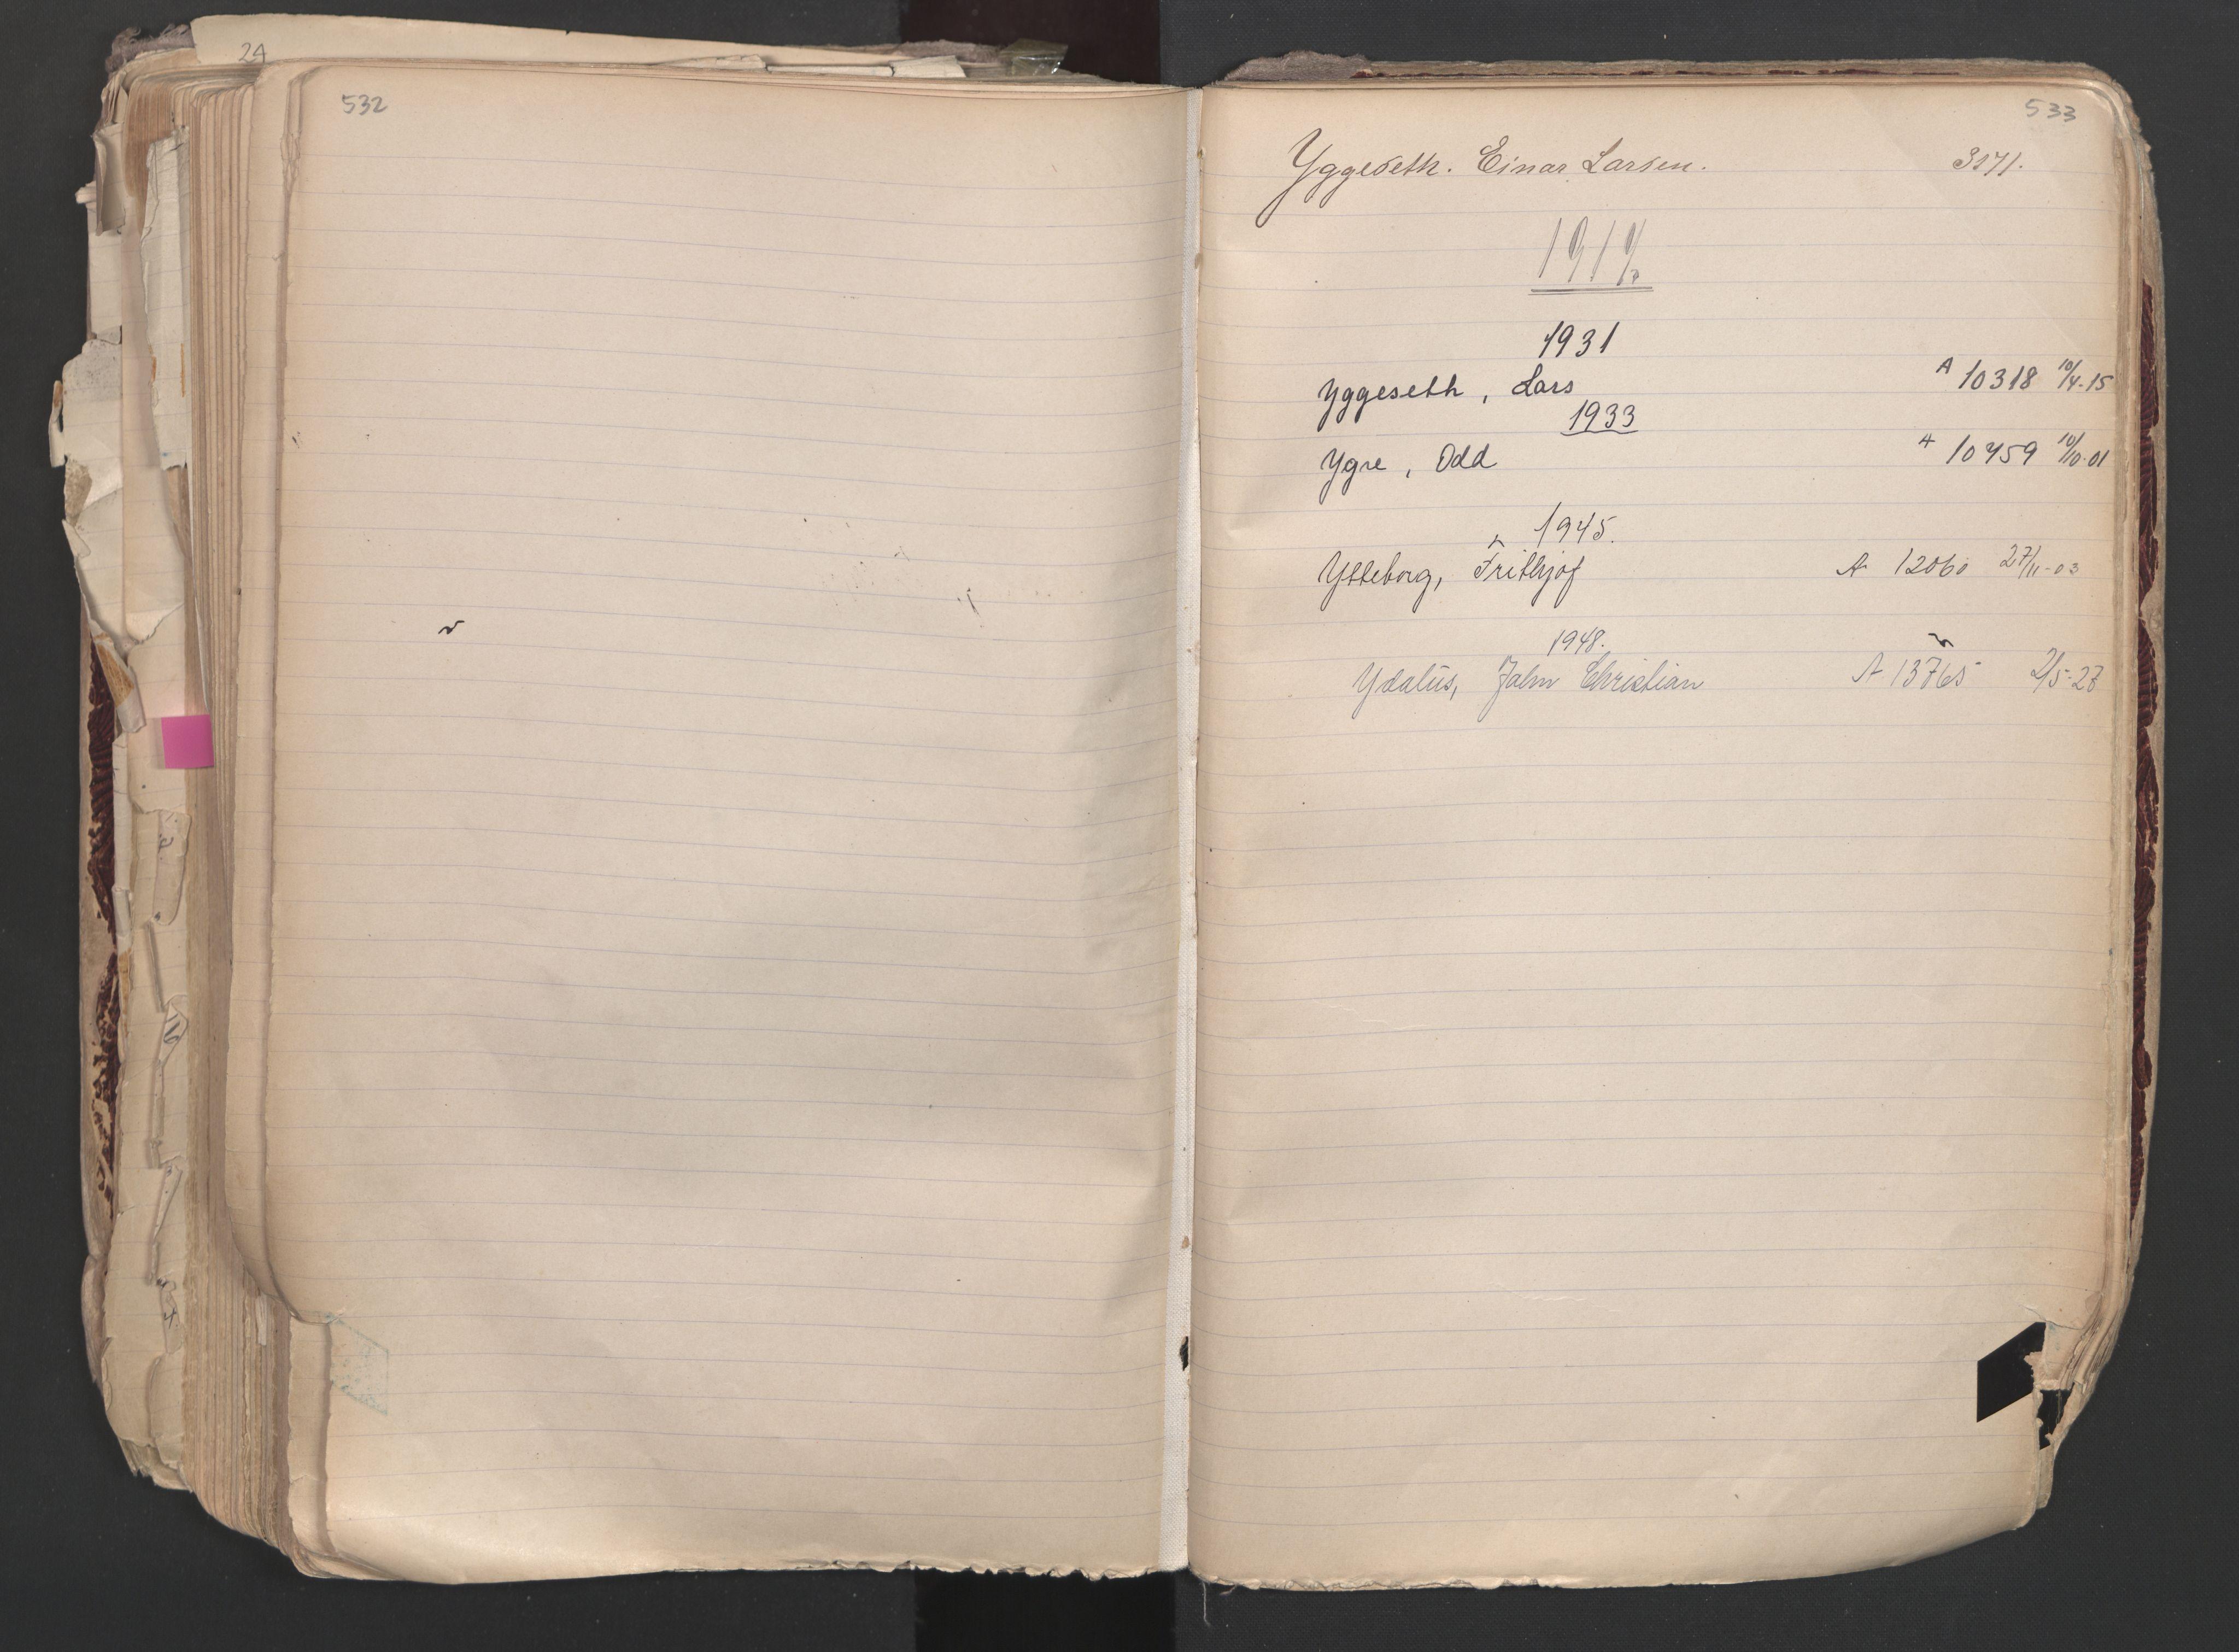 SAO, Oslo sjømannskontor, F/Fa/L0003: Register for Oslo mønstringskrets, 1891-1948, s. 532-533